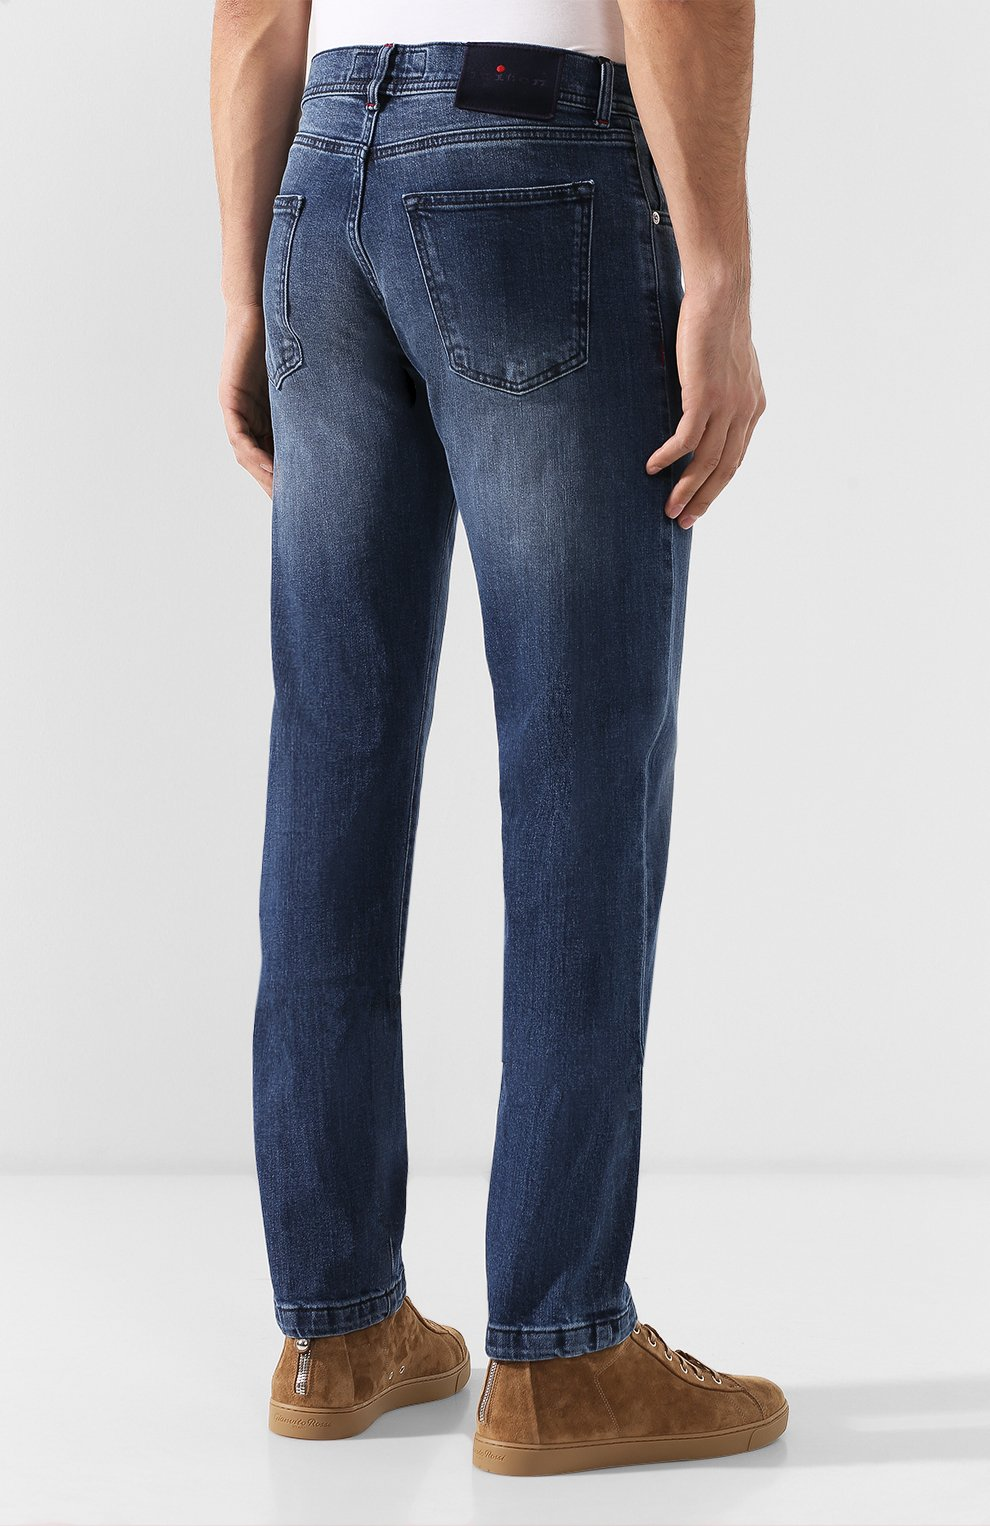 Мужские джинсы прямого кроя KITON синего цвета, арт. UPNJS/J07R52 | Фото 4